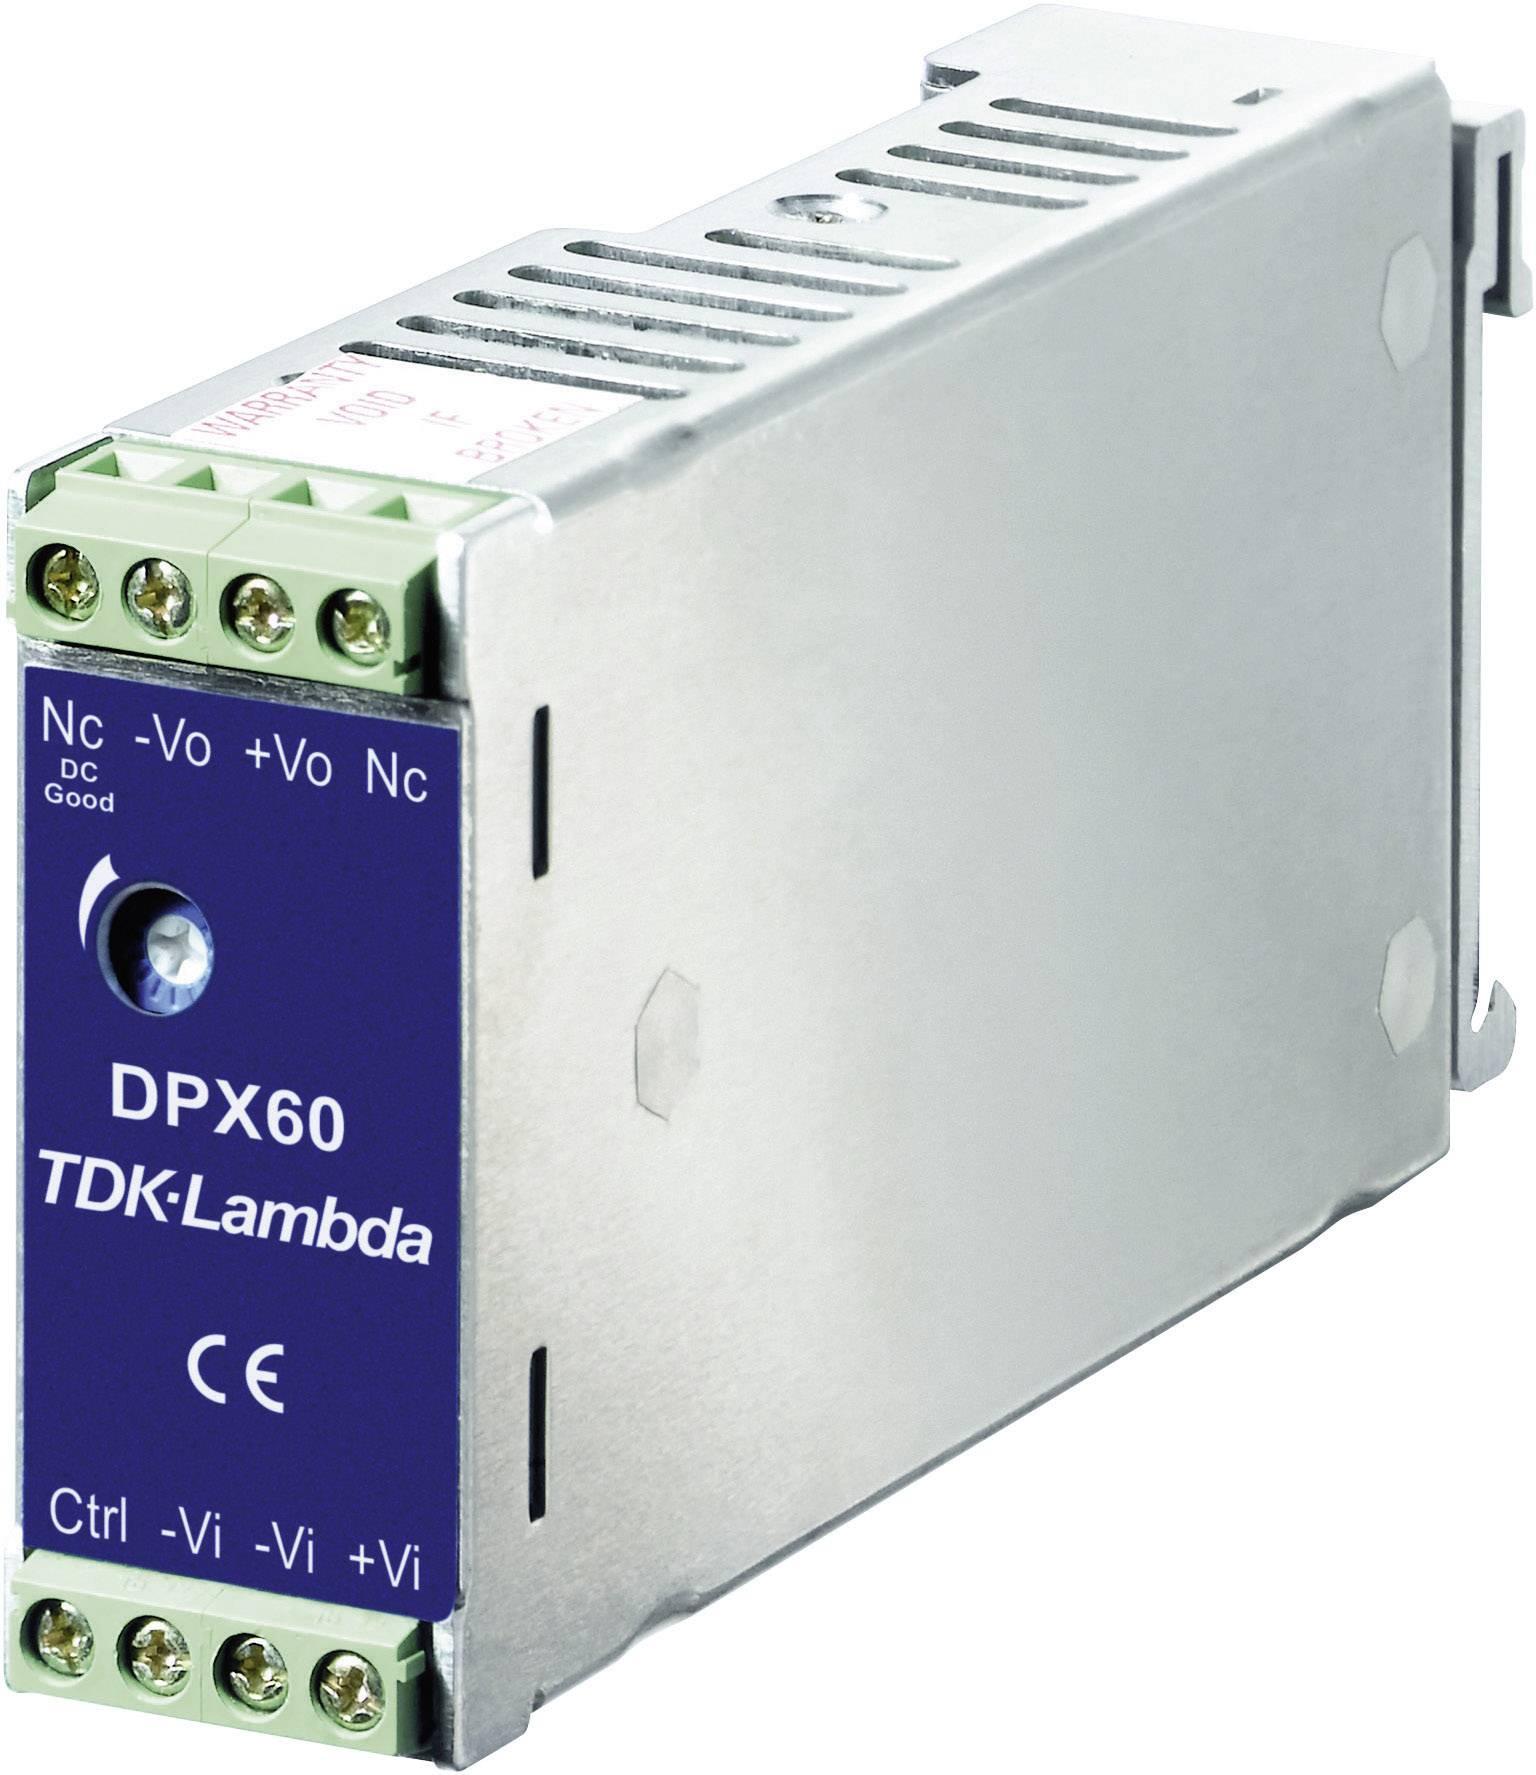 Zdroj na DIN lištu TDK-Lambda DPX-60-24S-3P3, 14 A, 3,3 V/DC